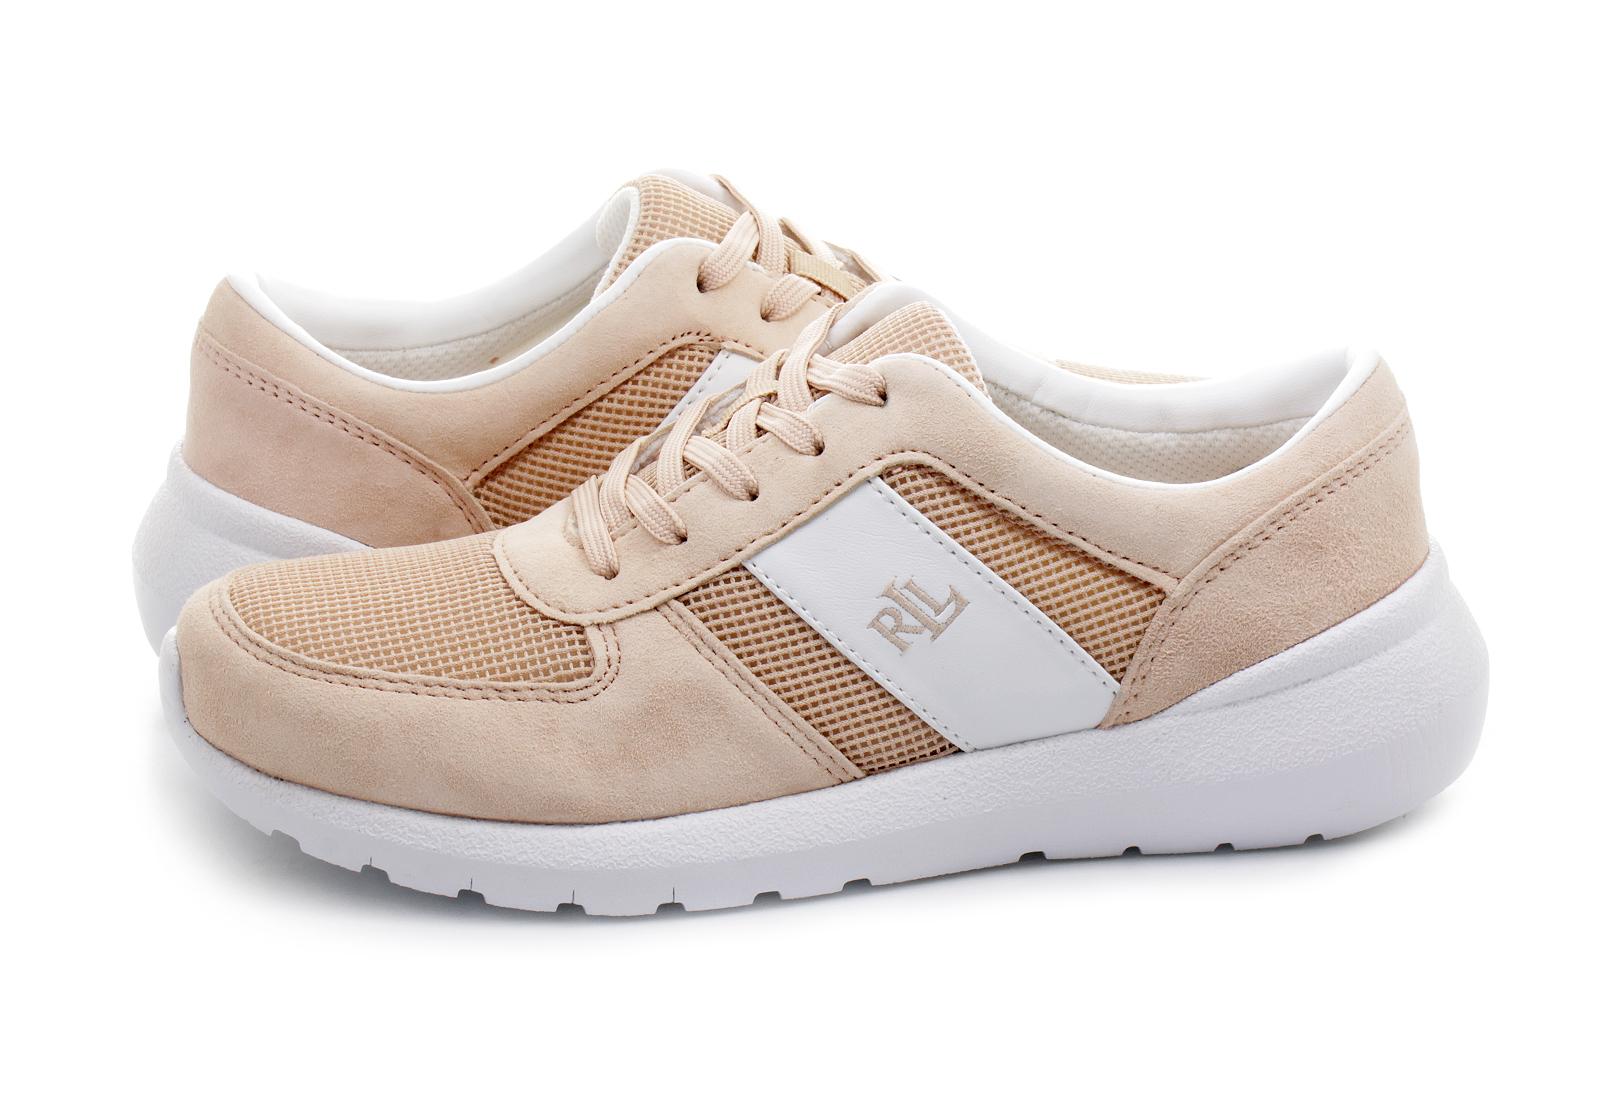 Polo Ralph Lauren Cipő - Jay - 802641767003 - Office Shoes Magyarország f3210e385e